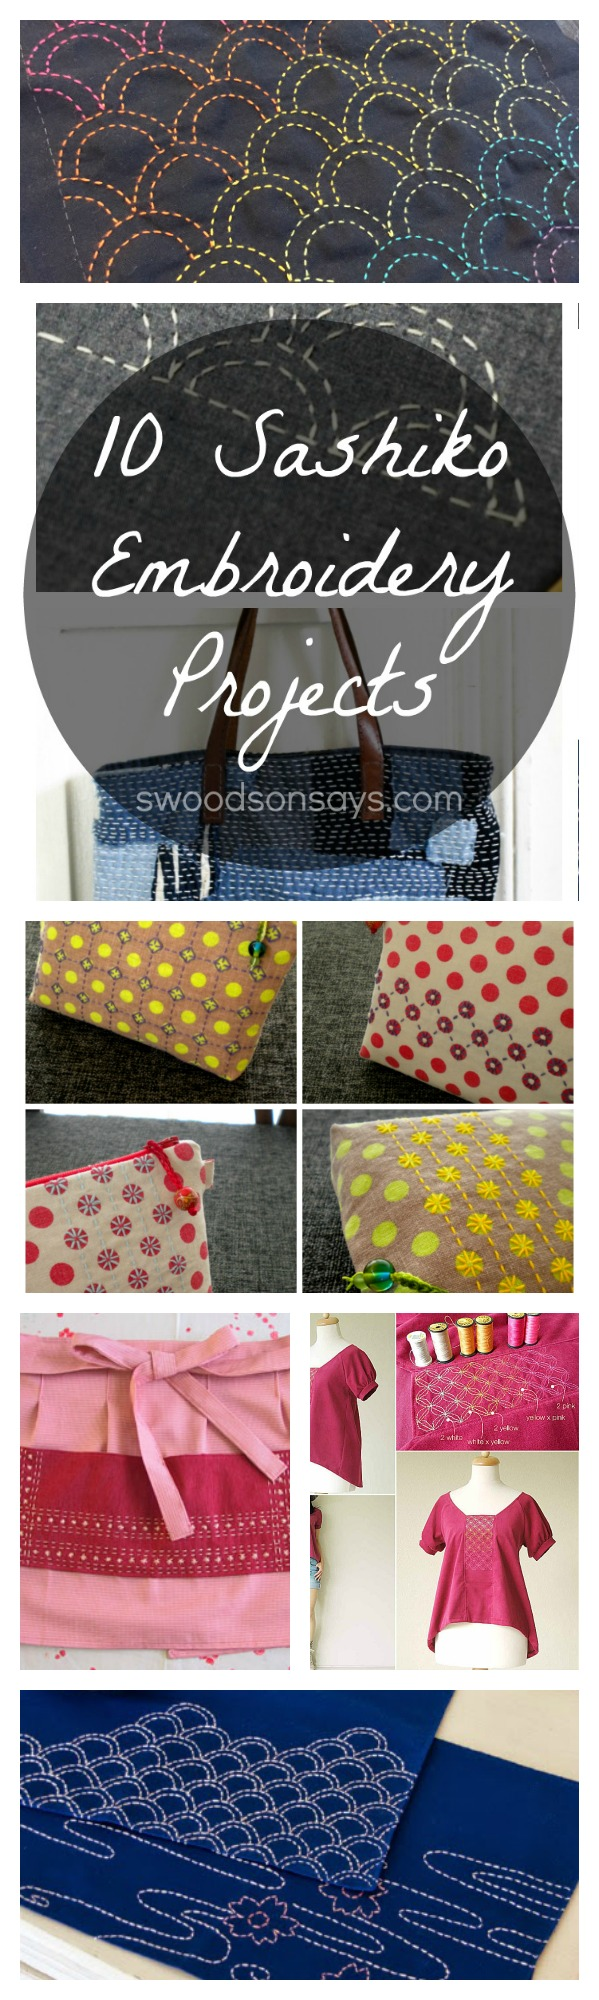 Sashiko Embroidery Tutorials